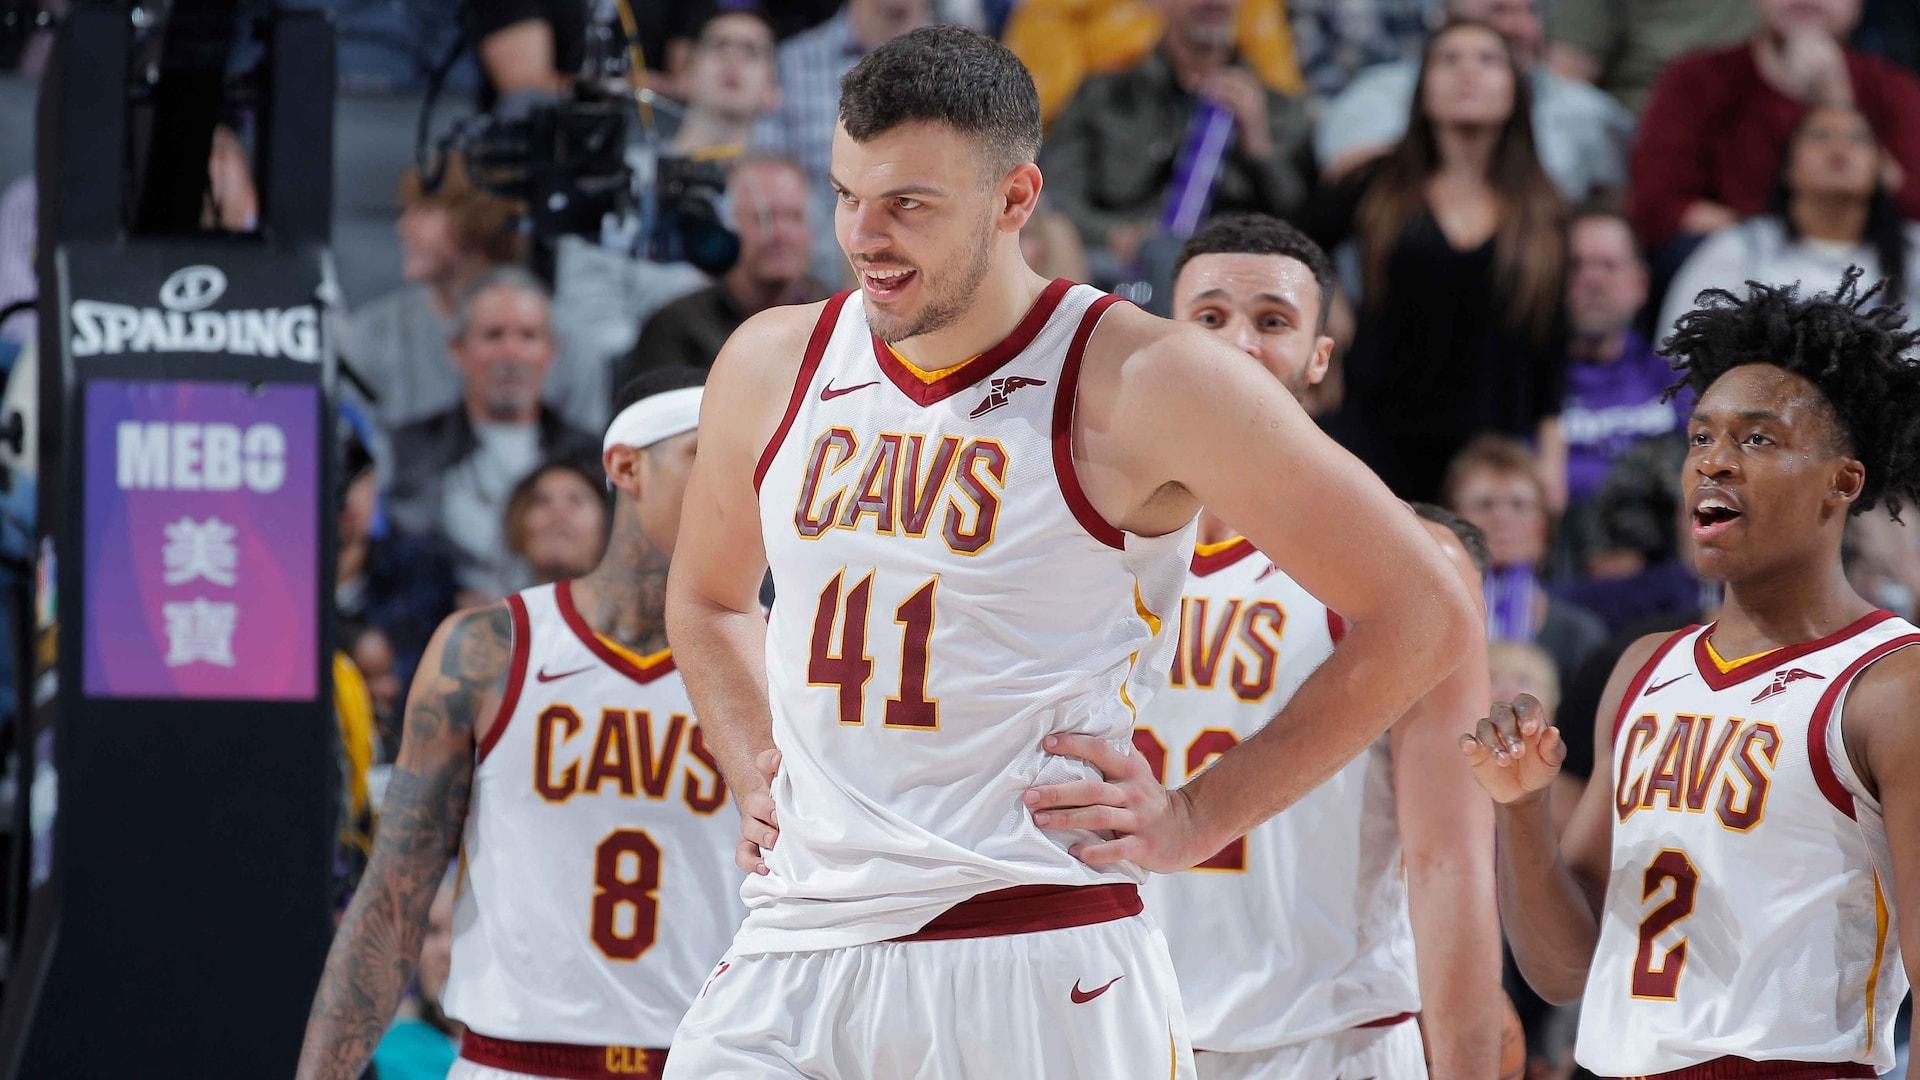 Cavaliers' Zizic out indefinitely with vertigo-like symptoms